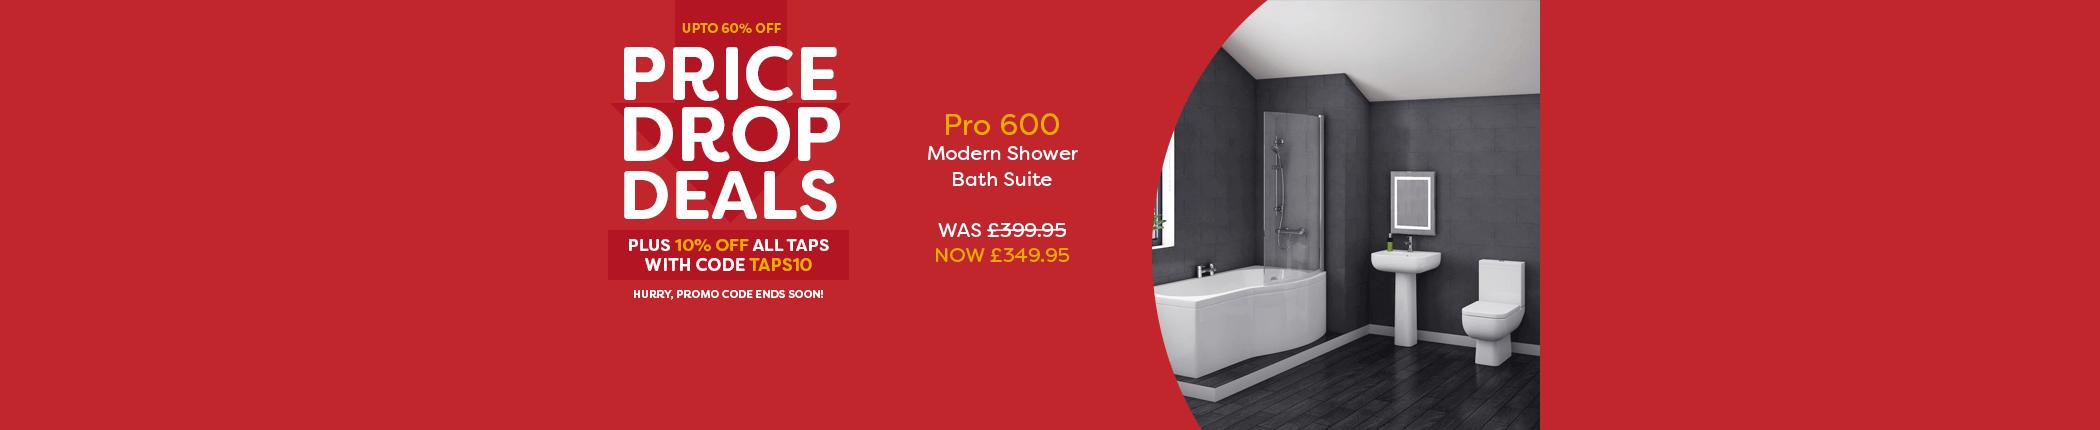 pricedropdeals-10off-taps-modern-shower-bath-countdown-june17-hbnr